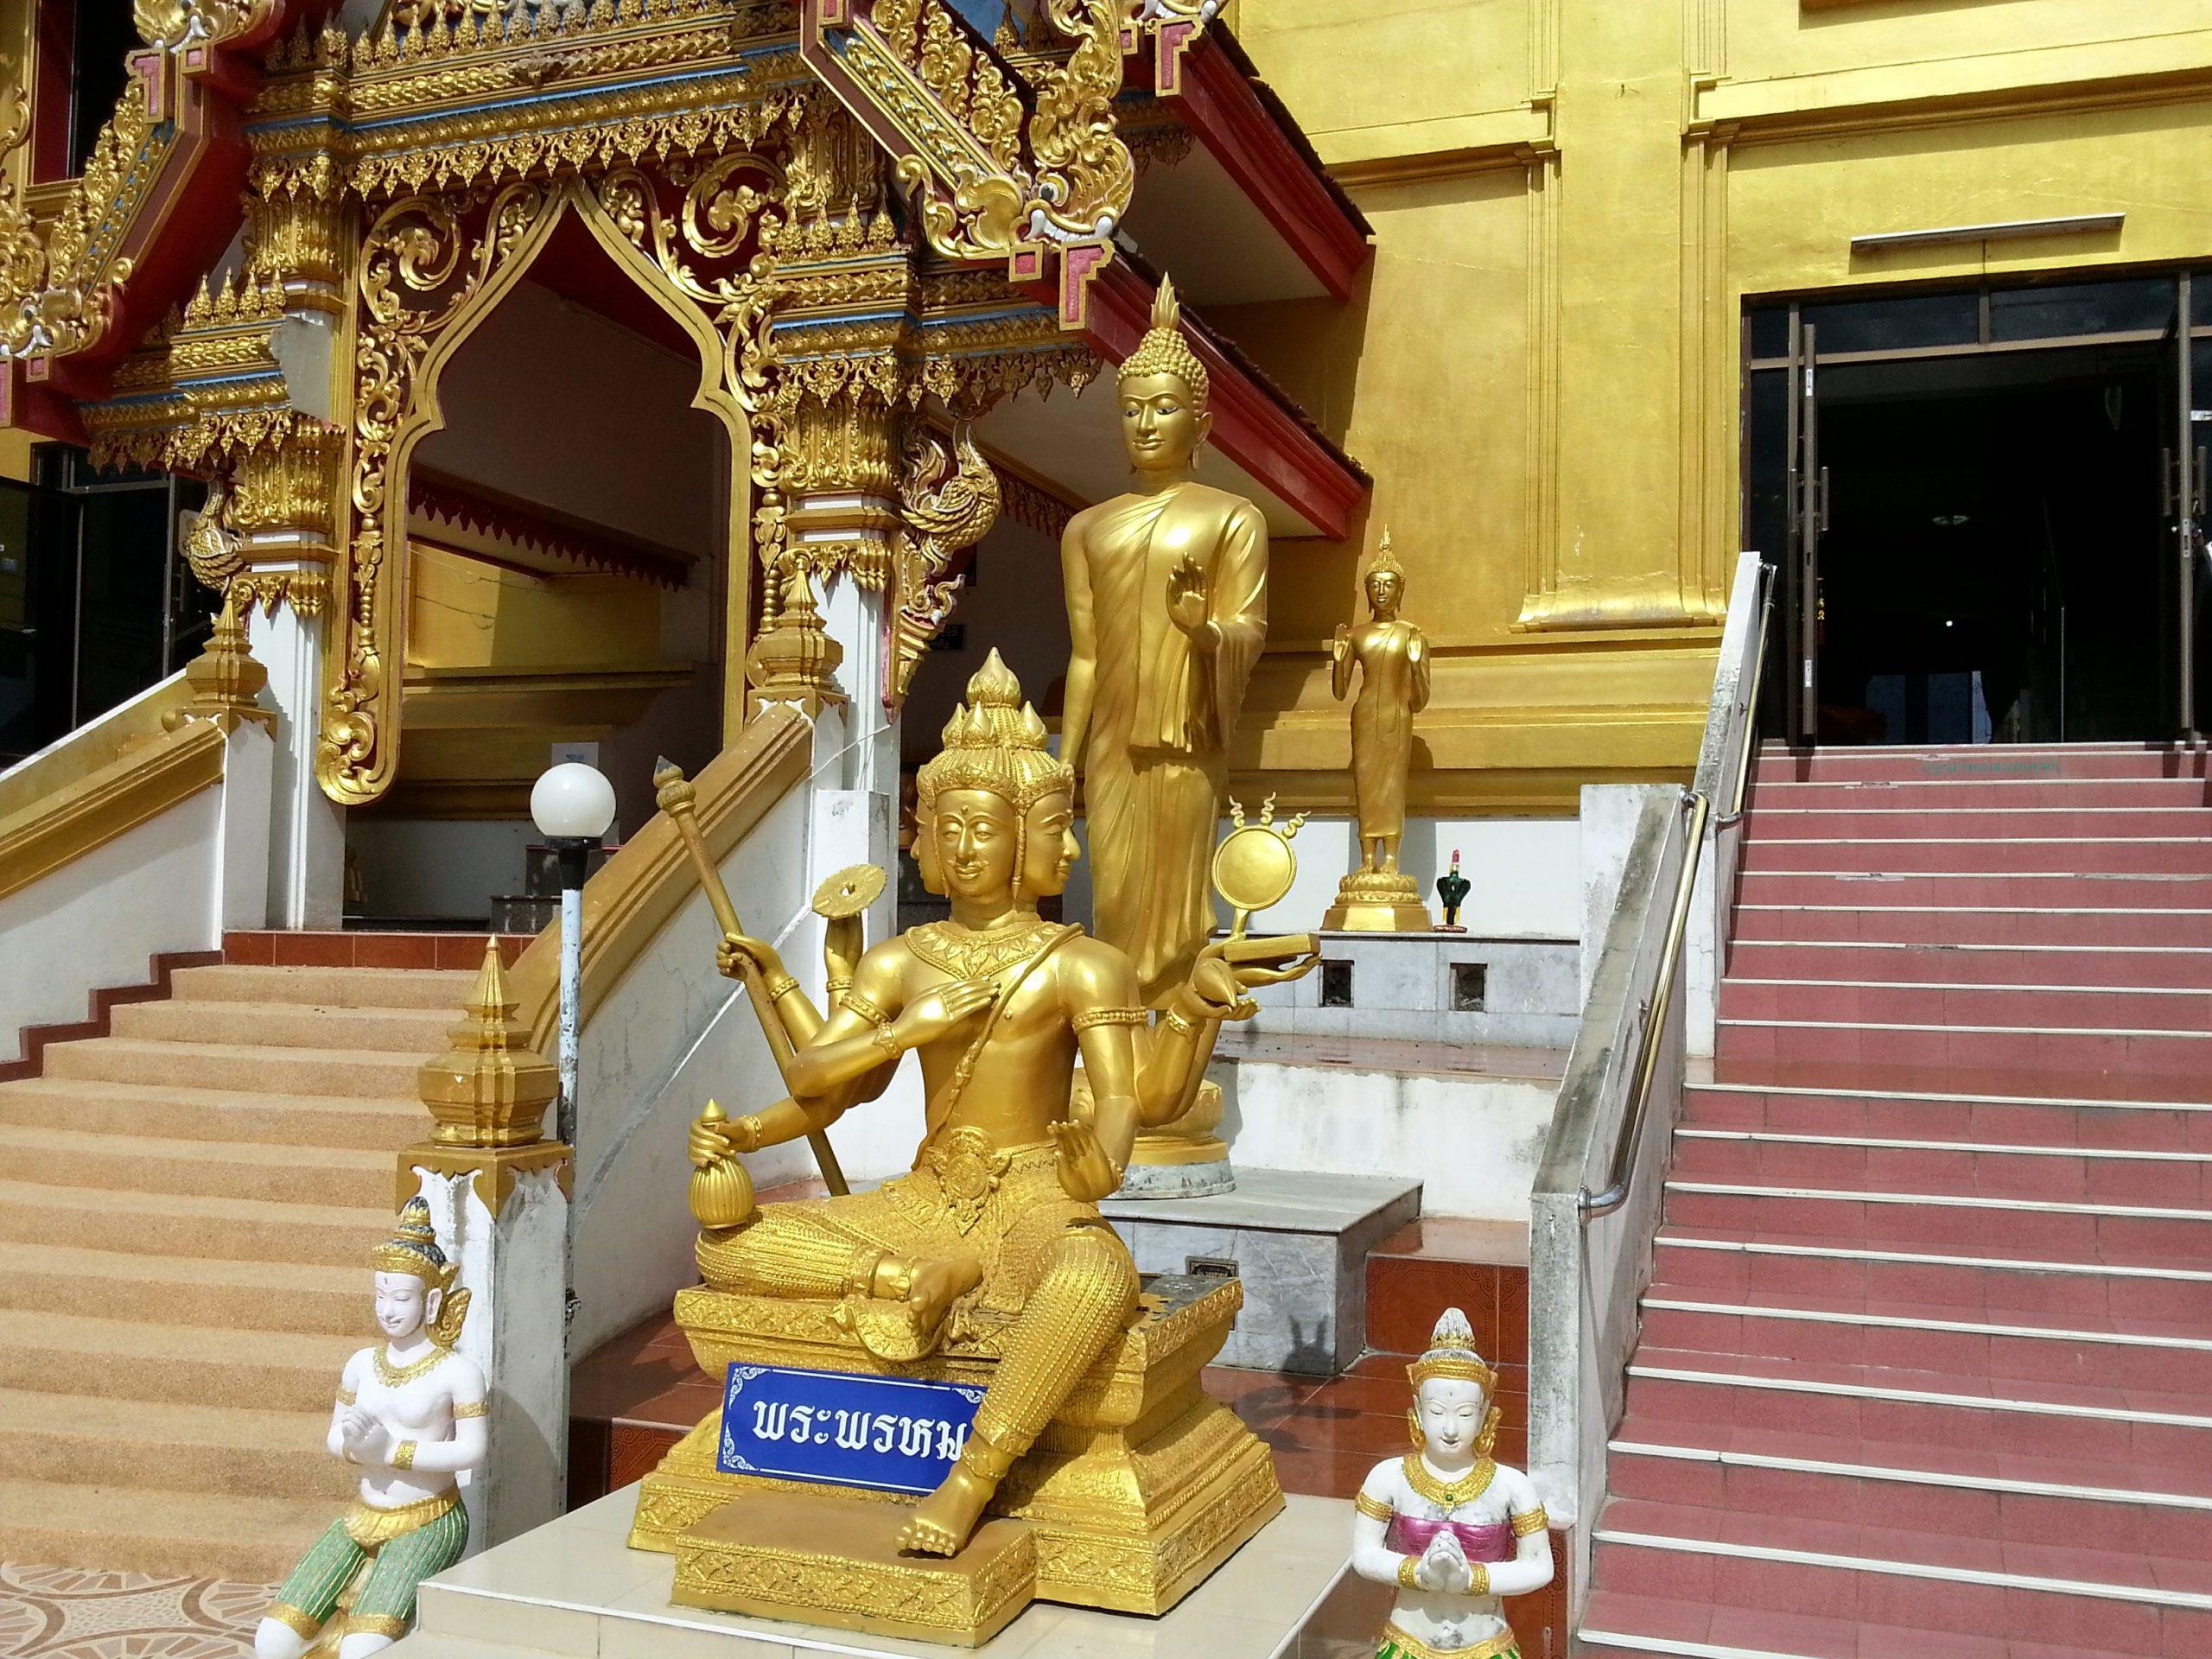 Four faced Buddha at the Phra Chulamanee Chedi